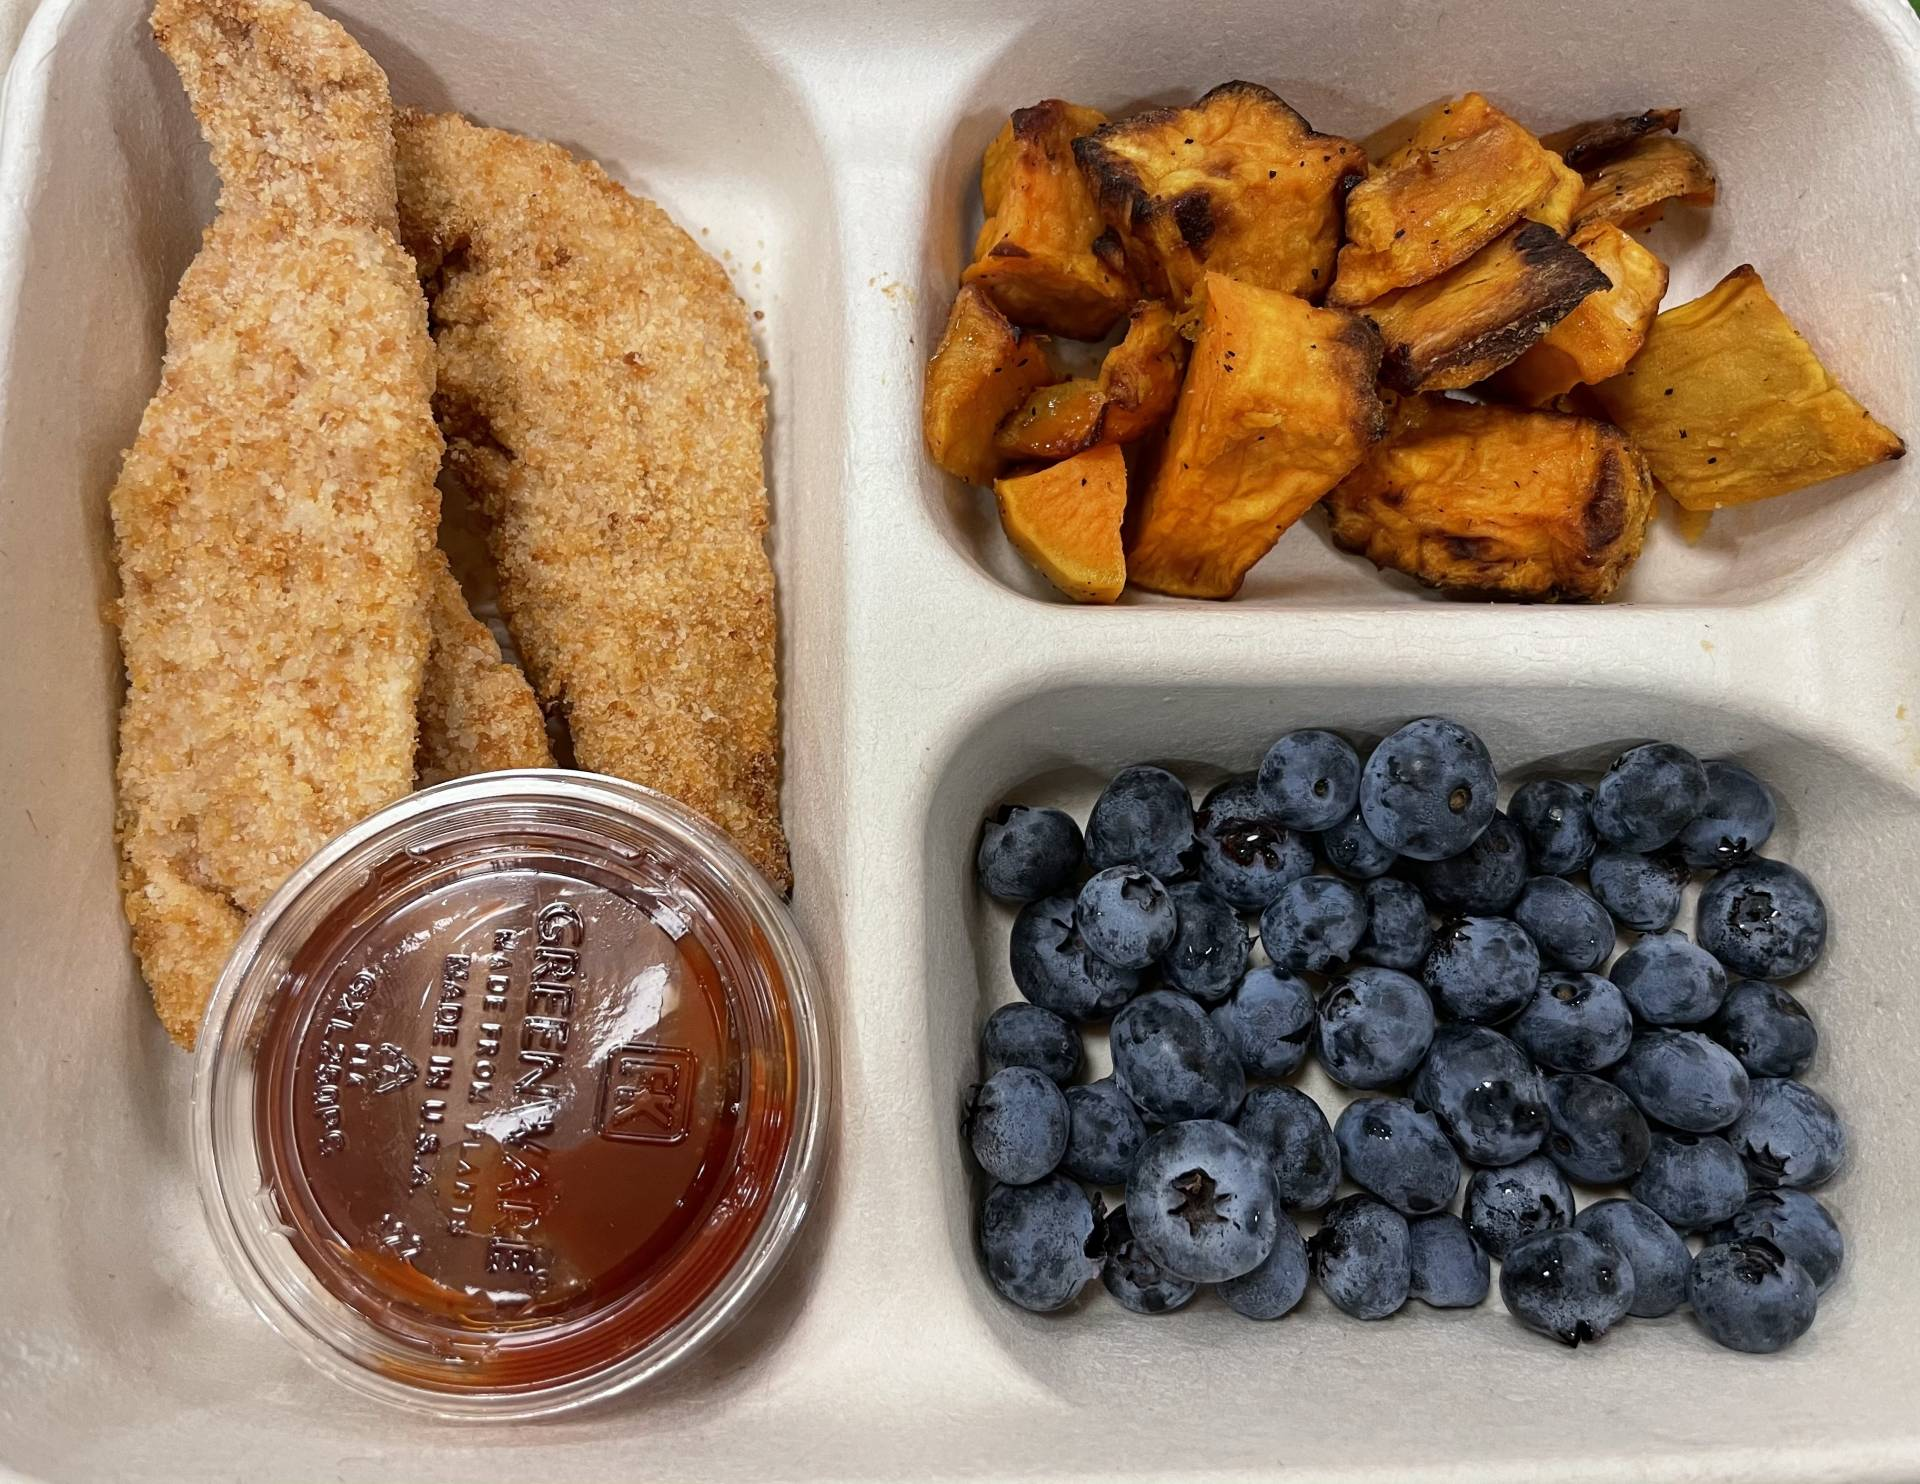 Kids Lunch: Chicken Tenders